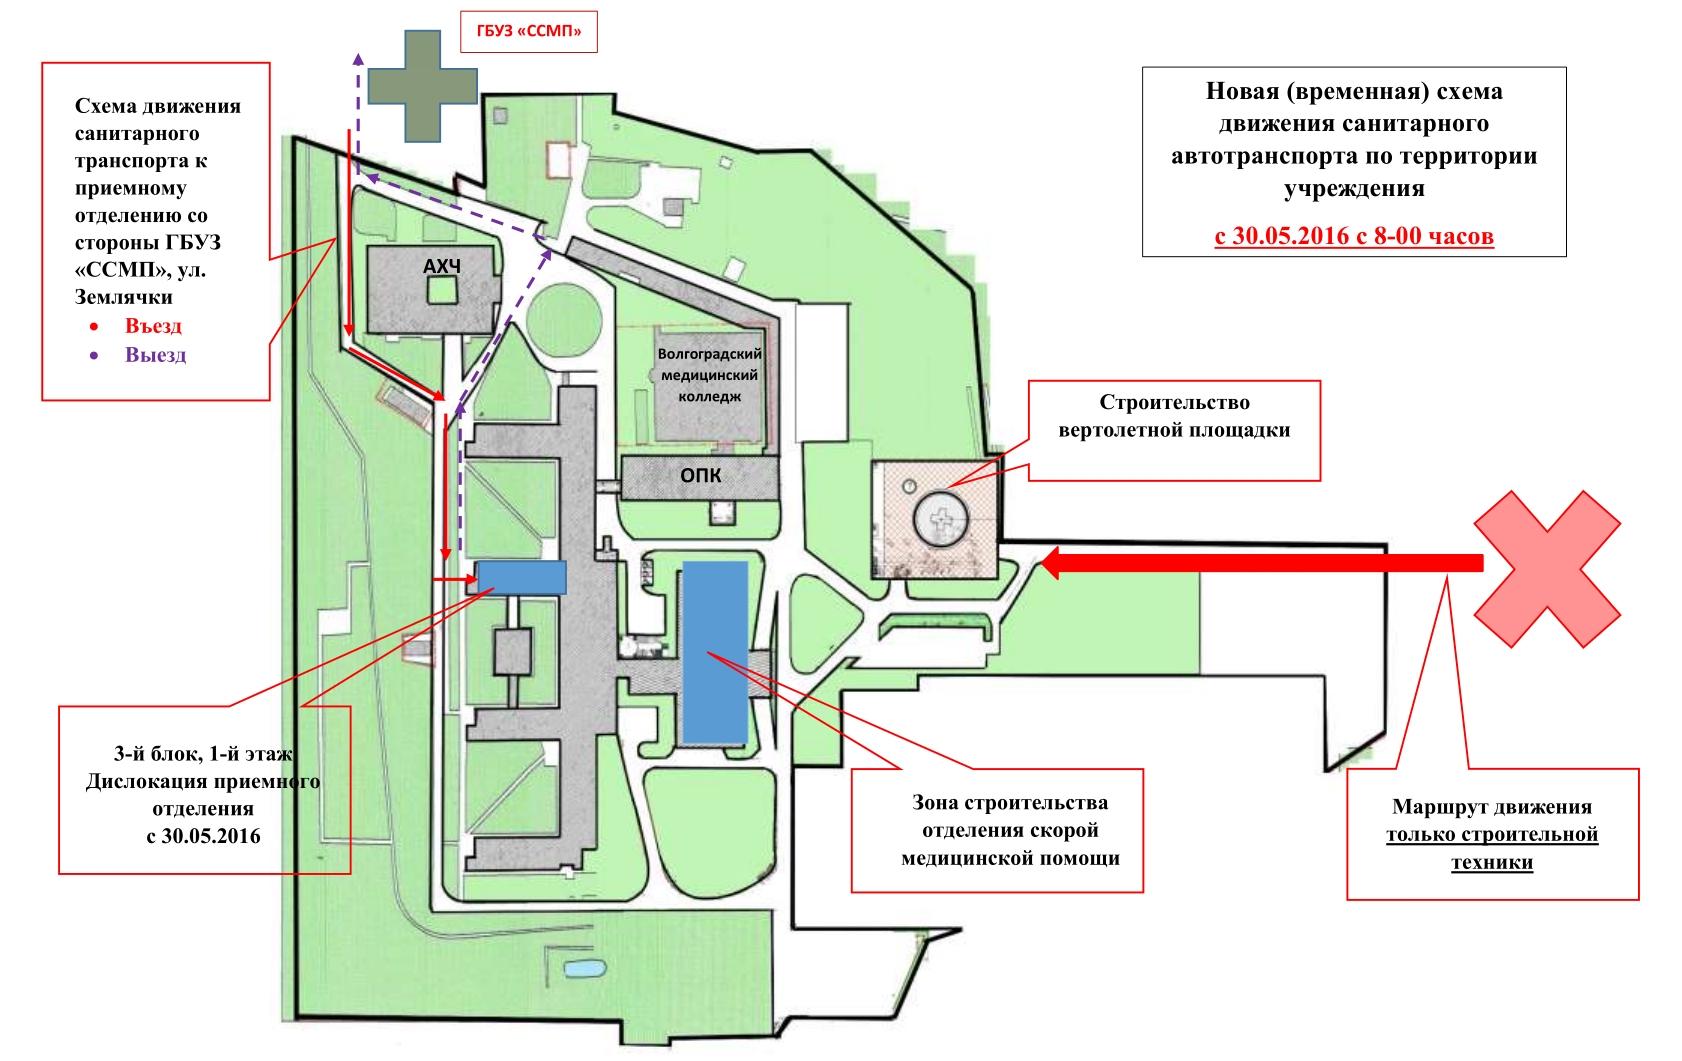 Волгоград 15 больница схема